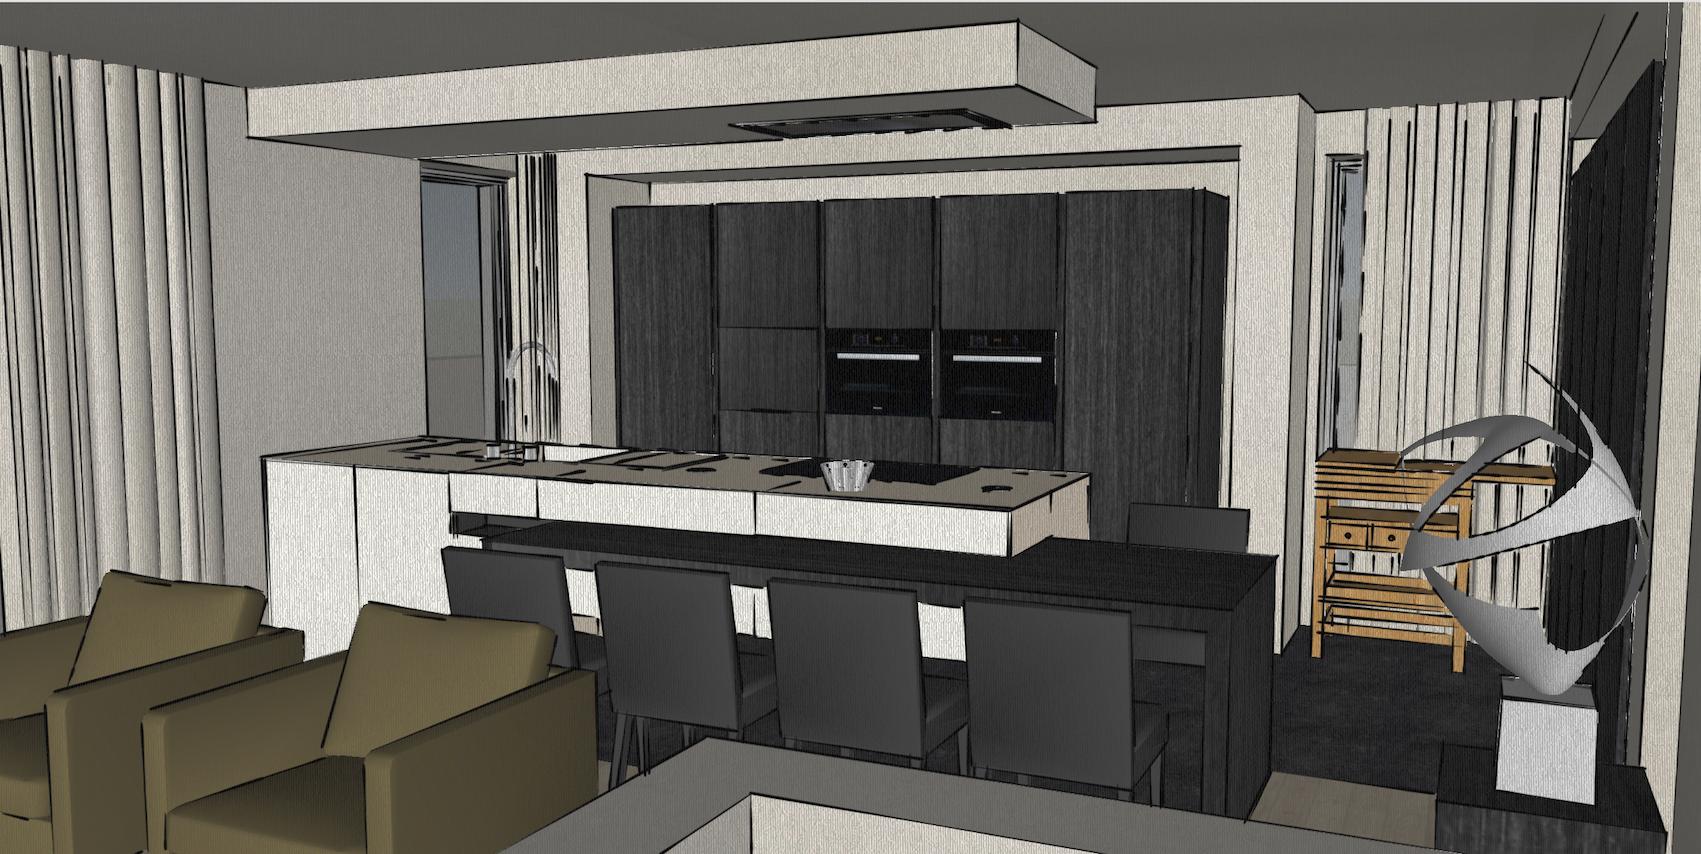 Academia duplex keuken